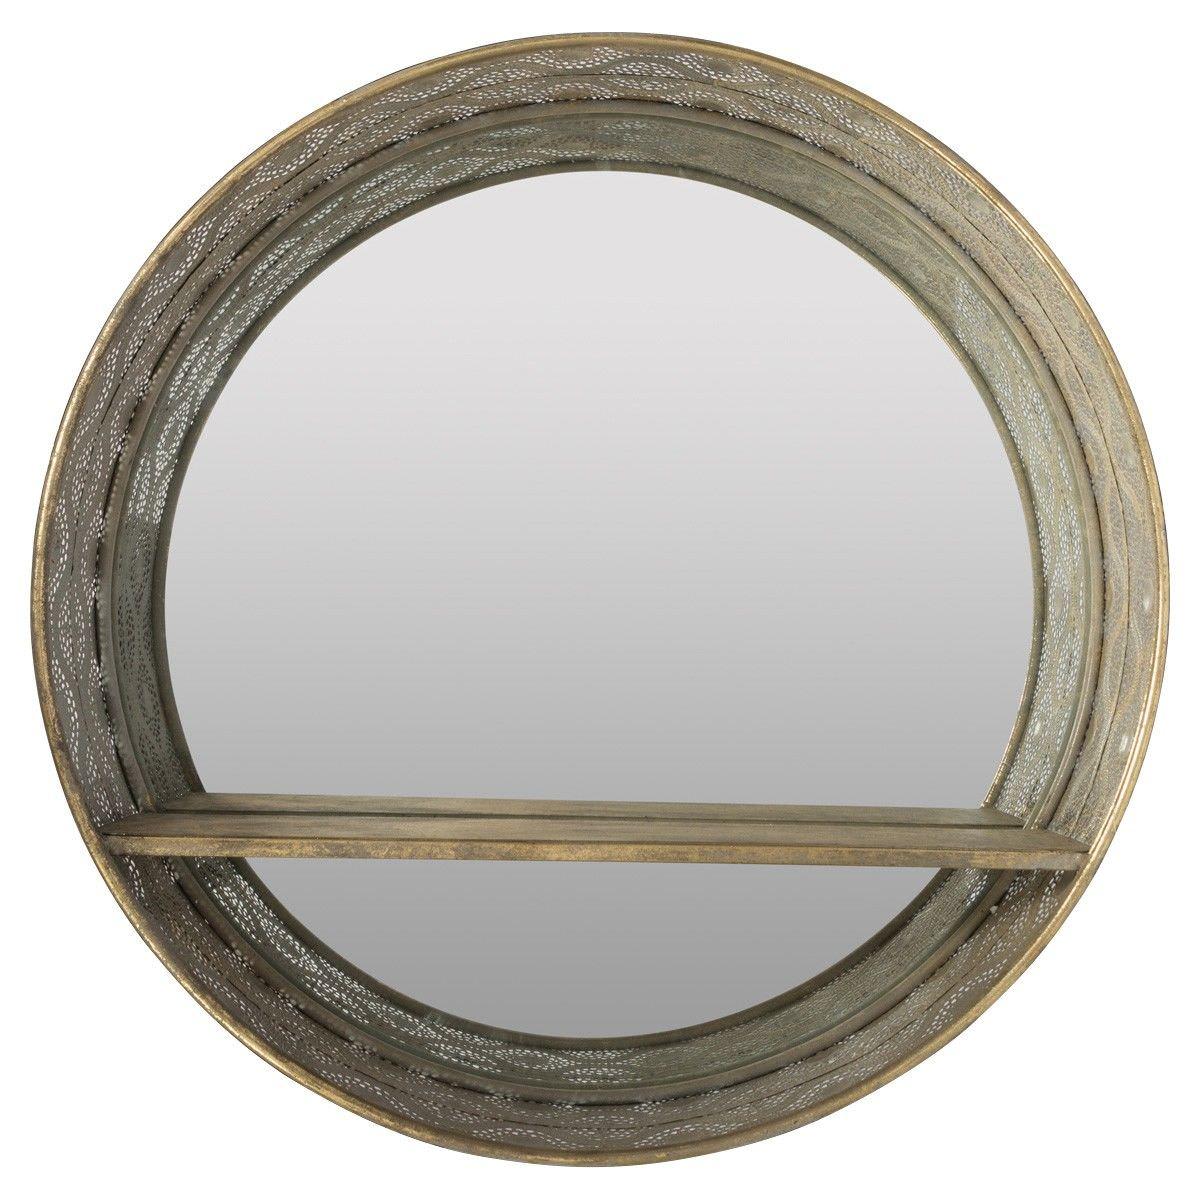 Aladdin Filigree Metal Frame Round Wall Mirror with Shelf, 60cm